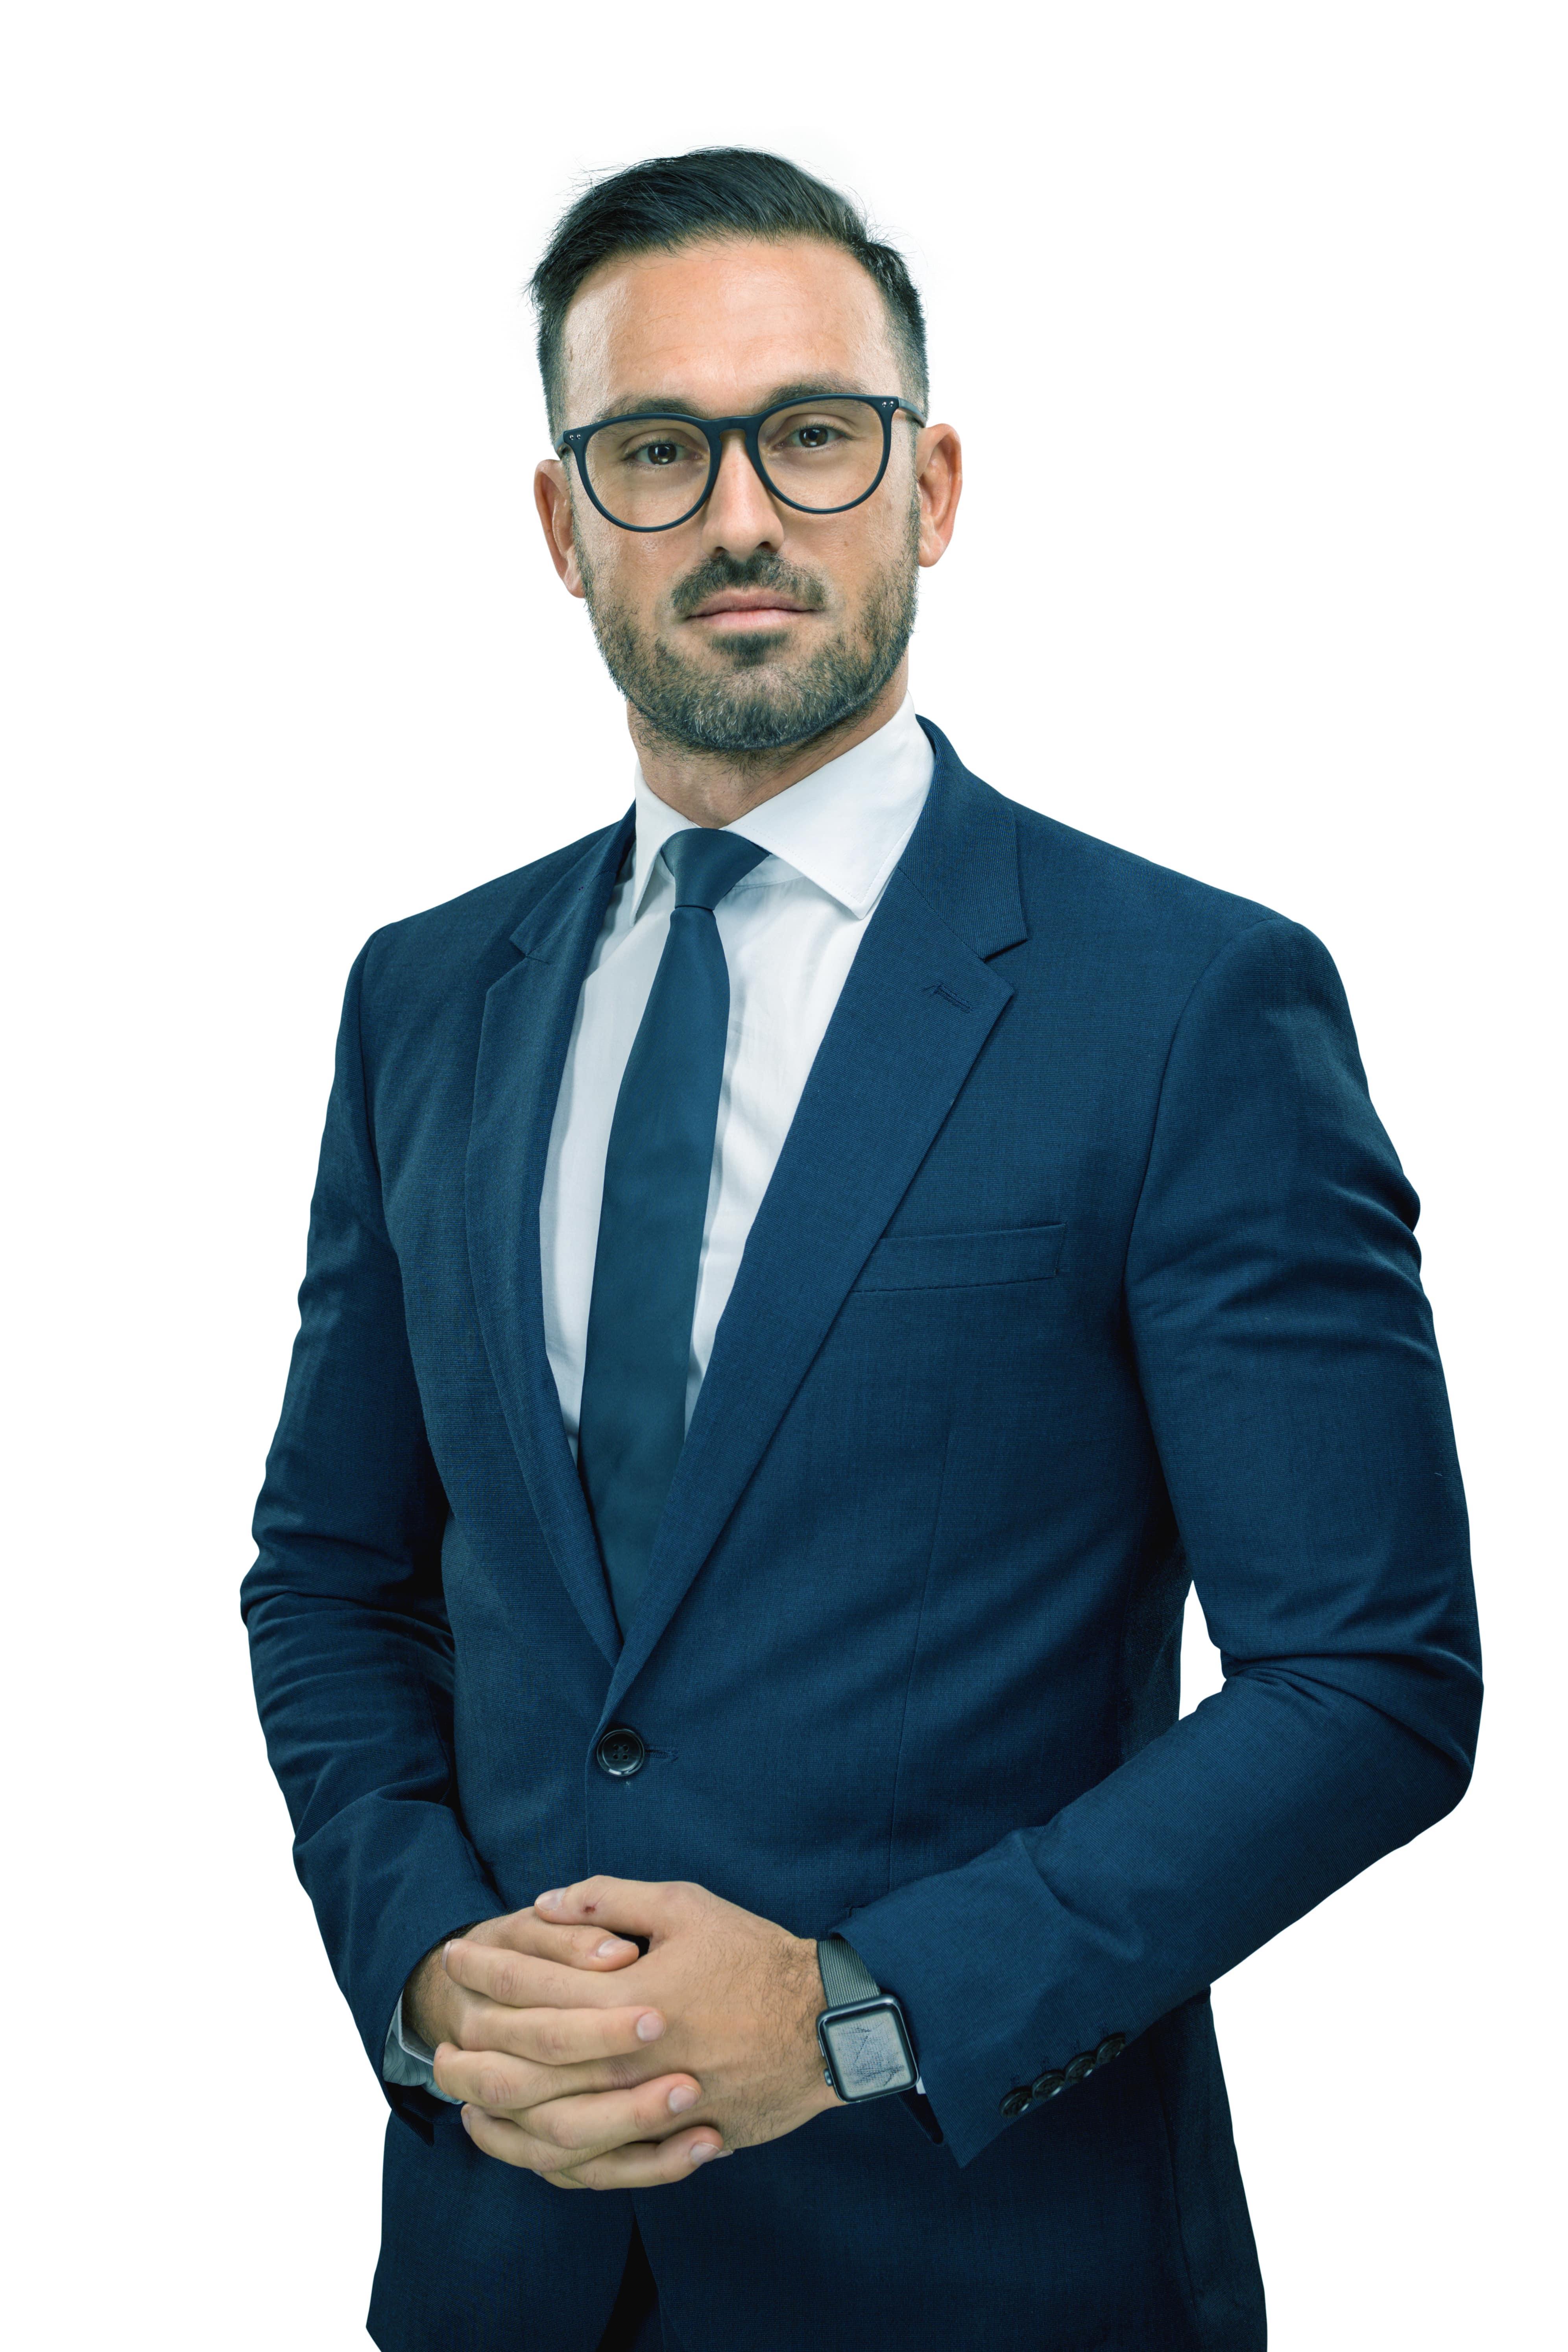 Wealth Advice Senior Associate - Mauro De Santis Bo